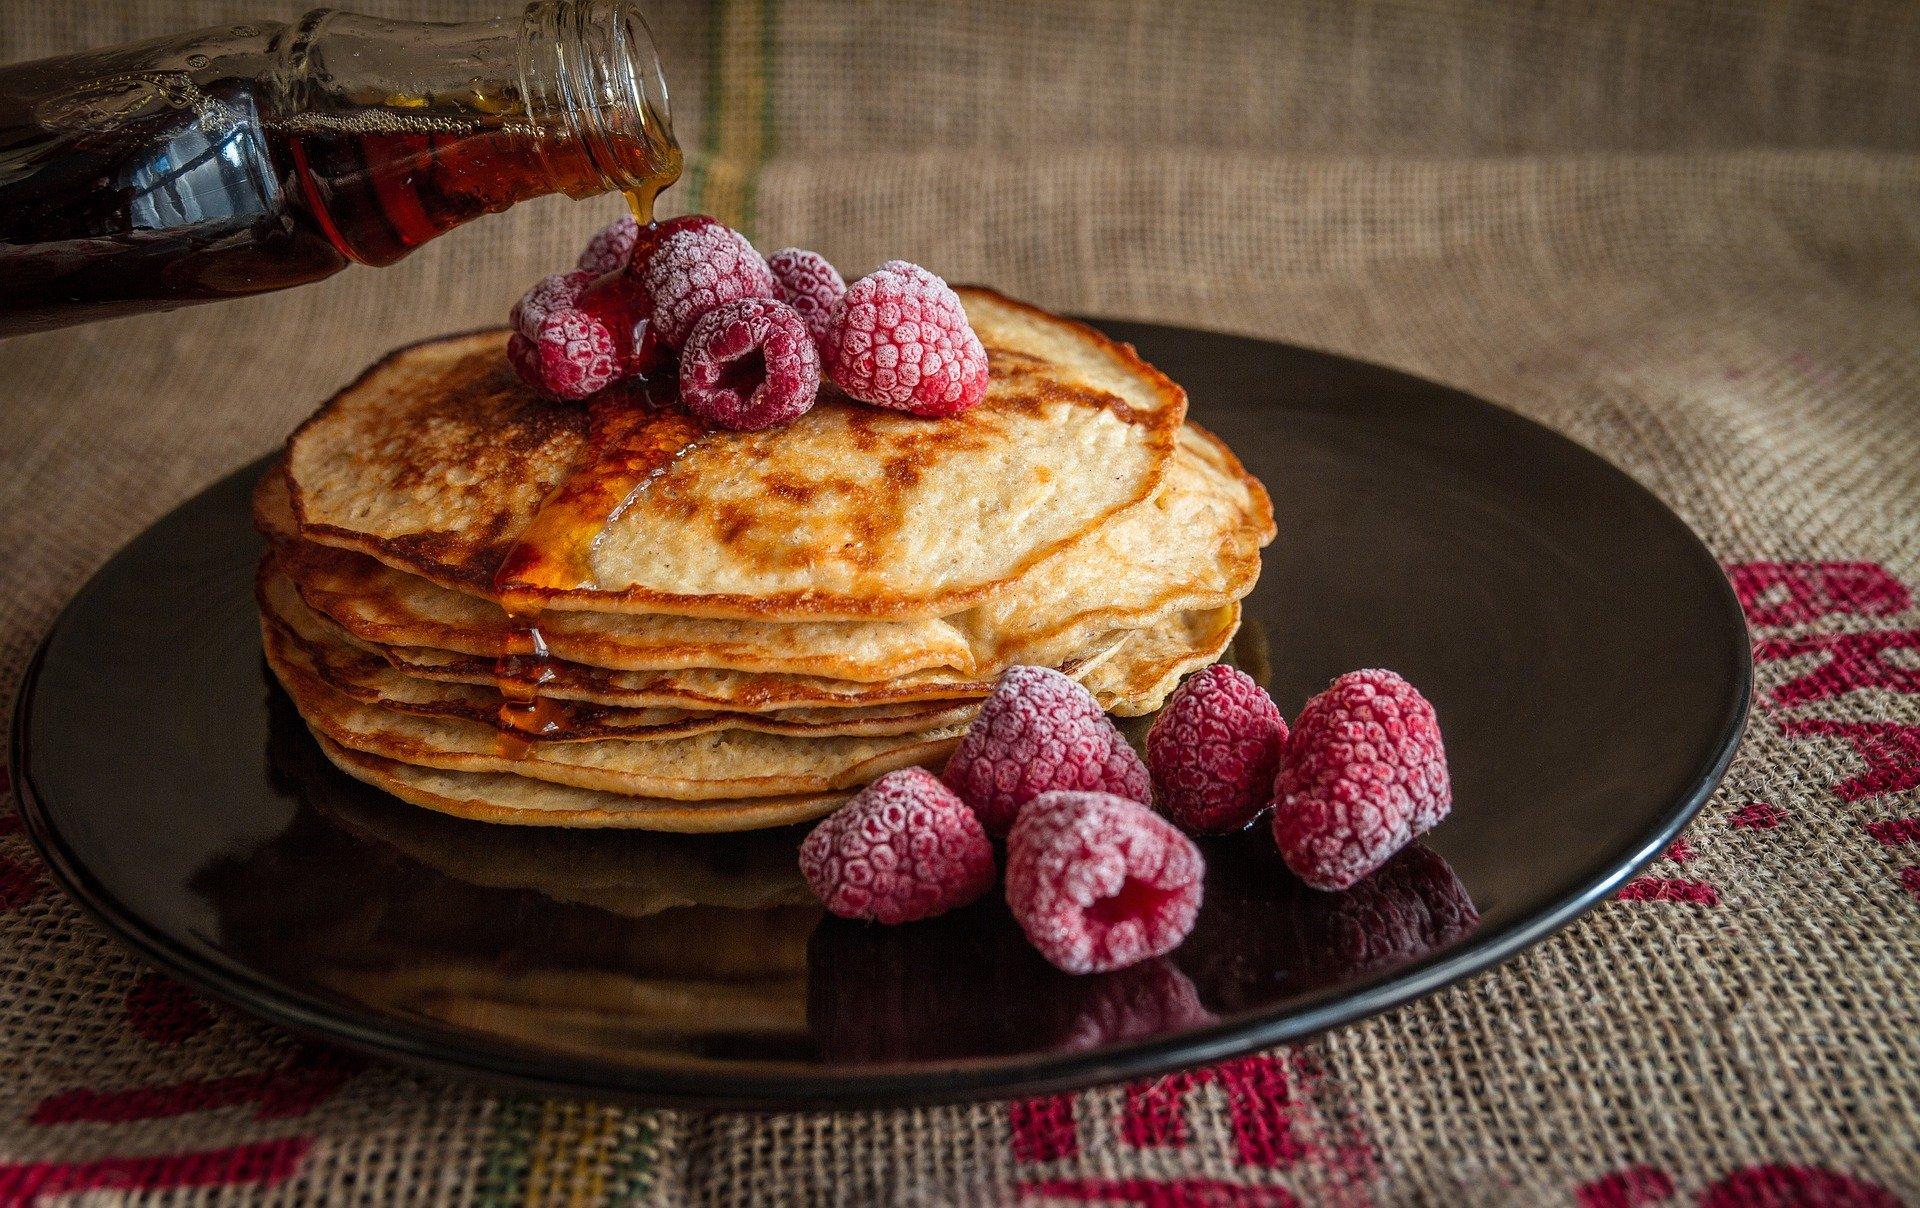 Leckere Pancakes im Room-Service anbieten